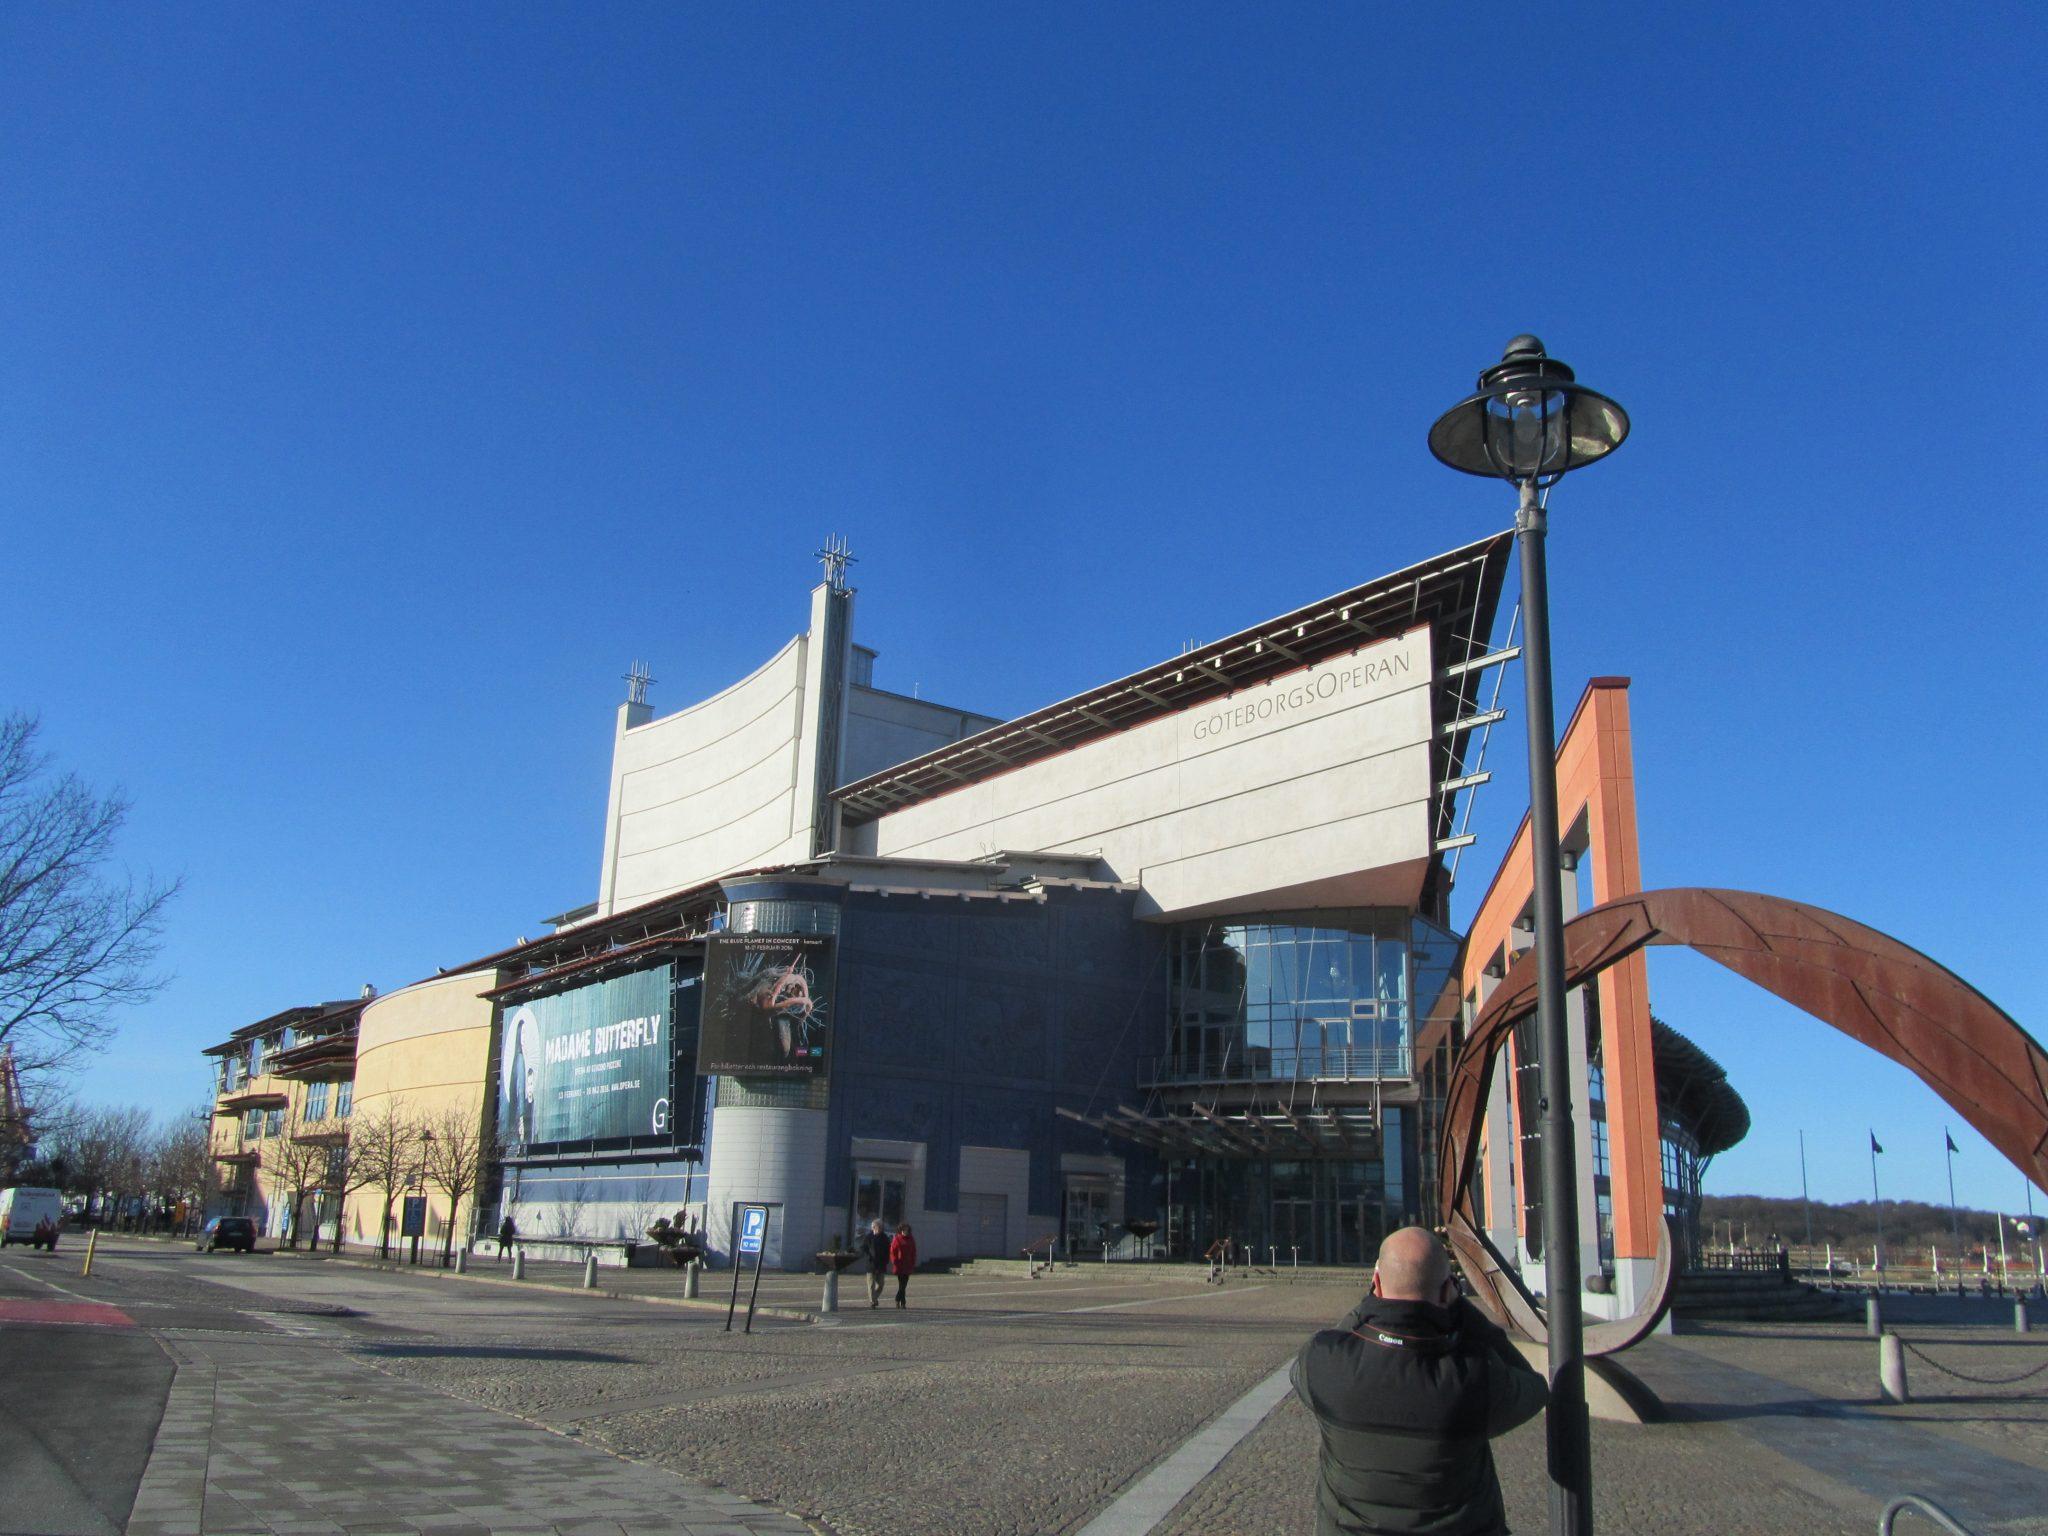 Gothenburg Opera House